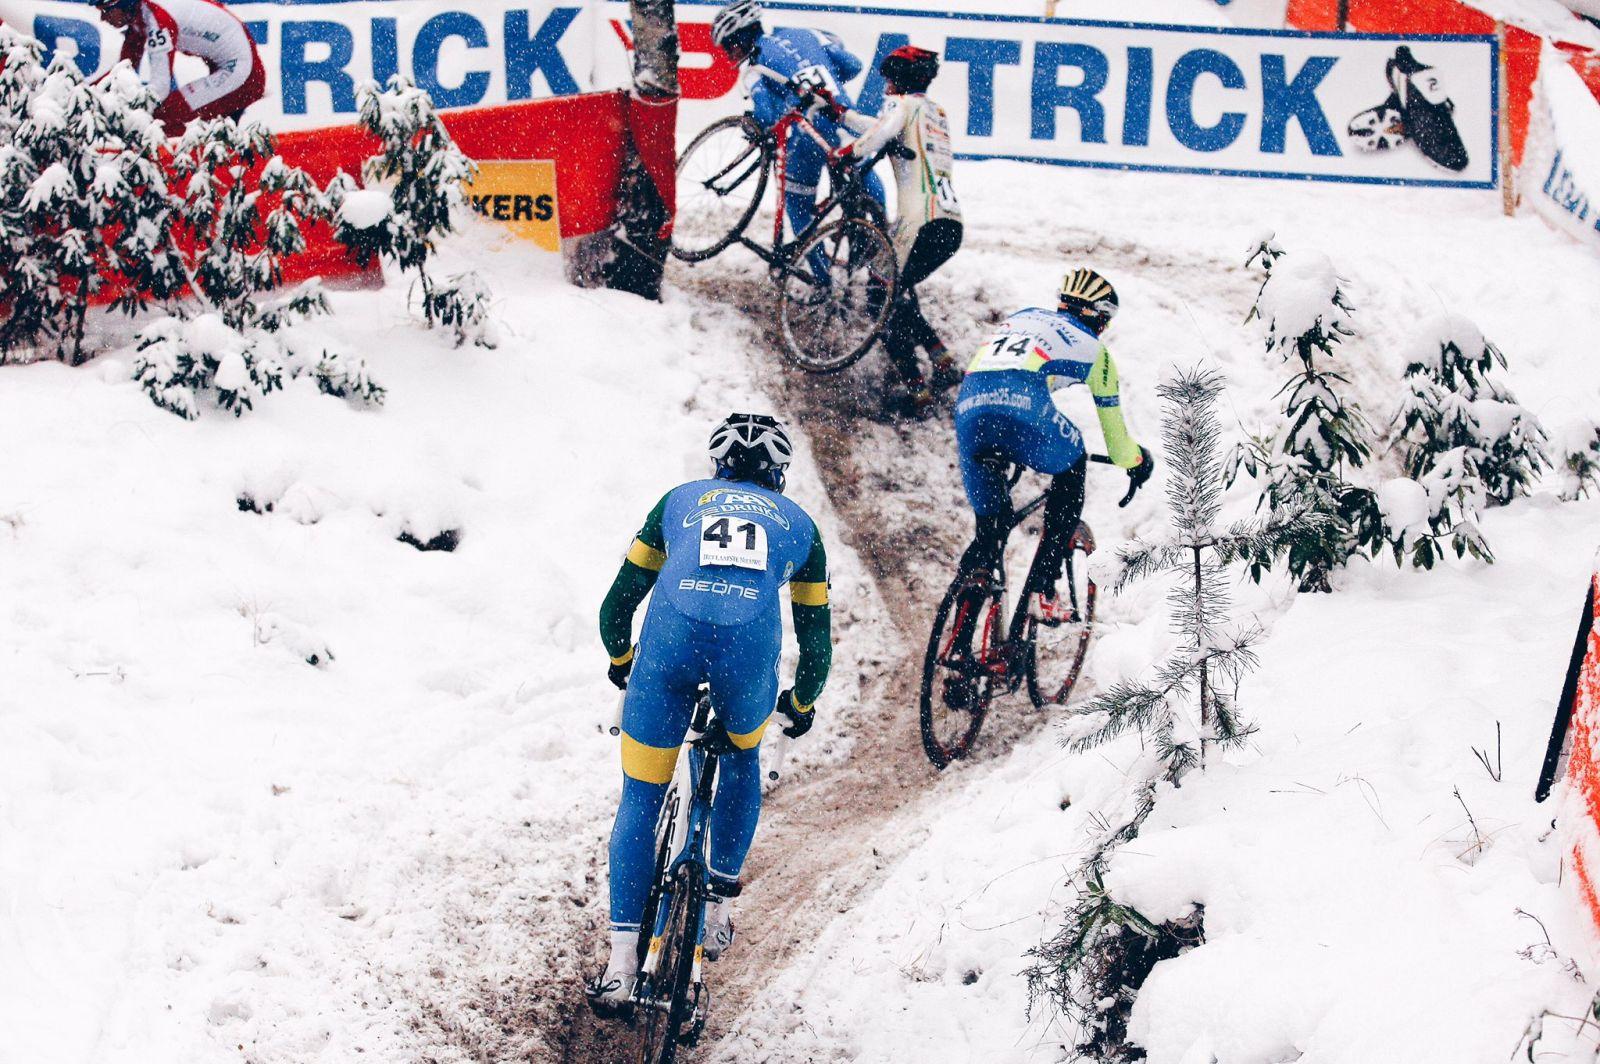 Nieve y ciclocross